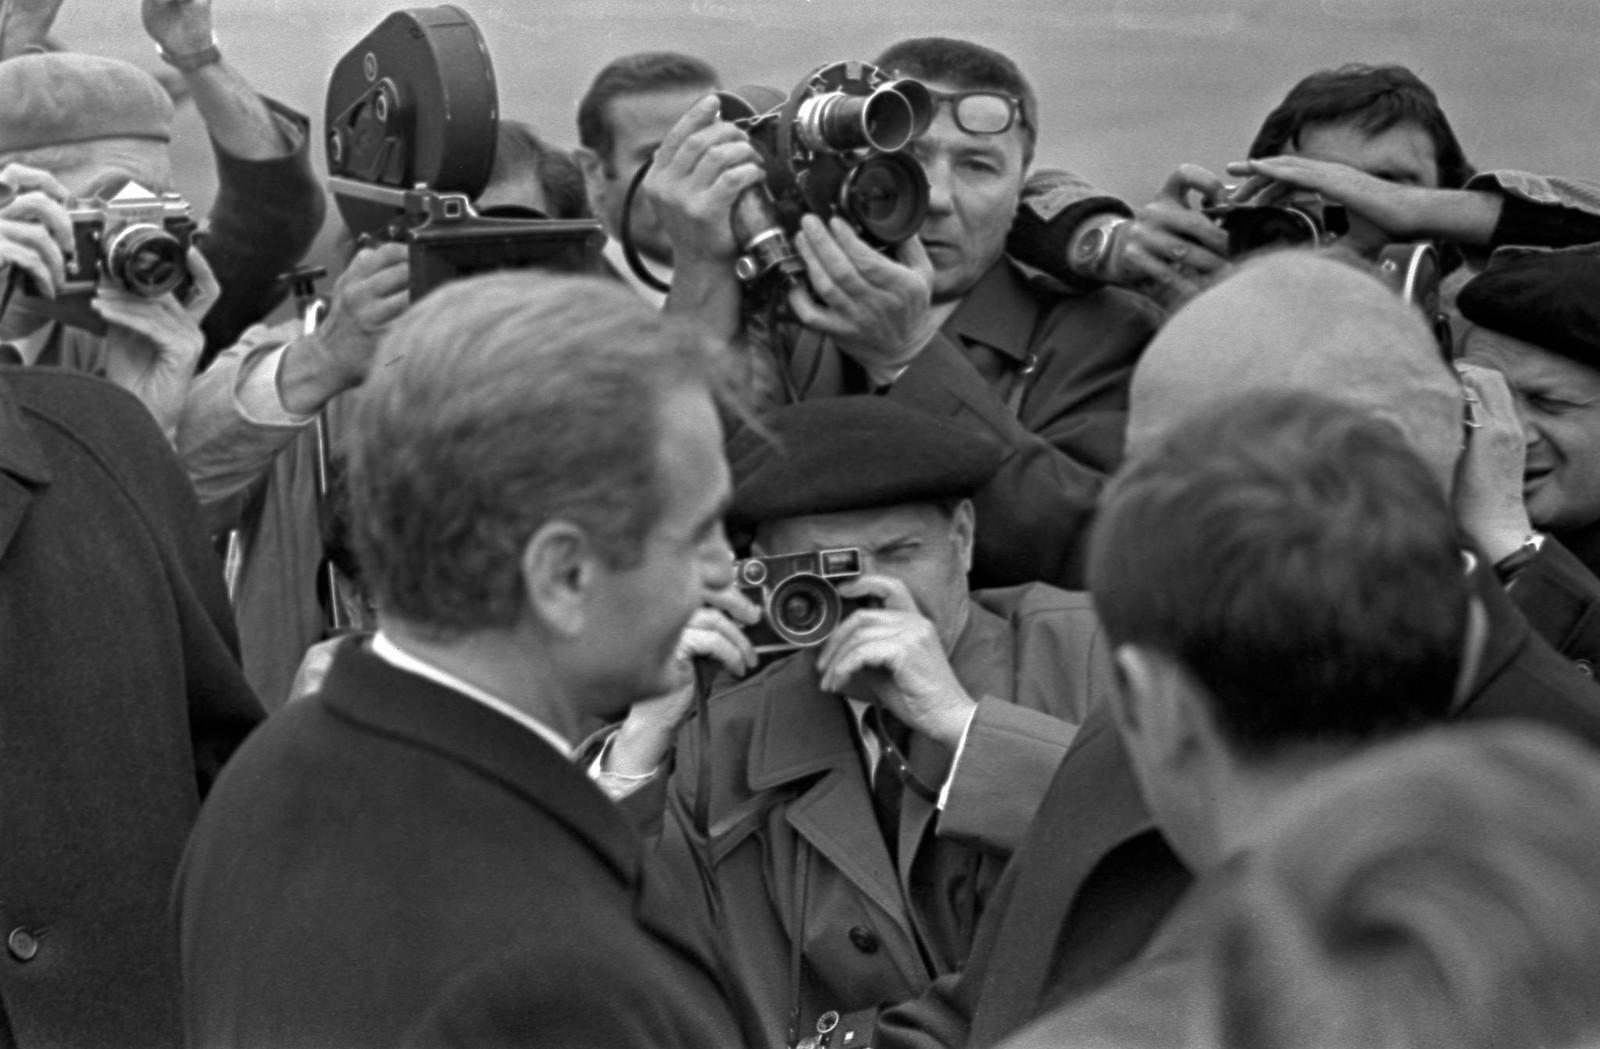 1972. Визит шахиншаха Ирана Мохаммеда Реза Пехлеви в Москву, Внуково